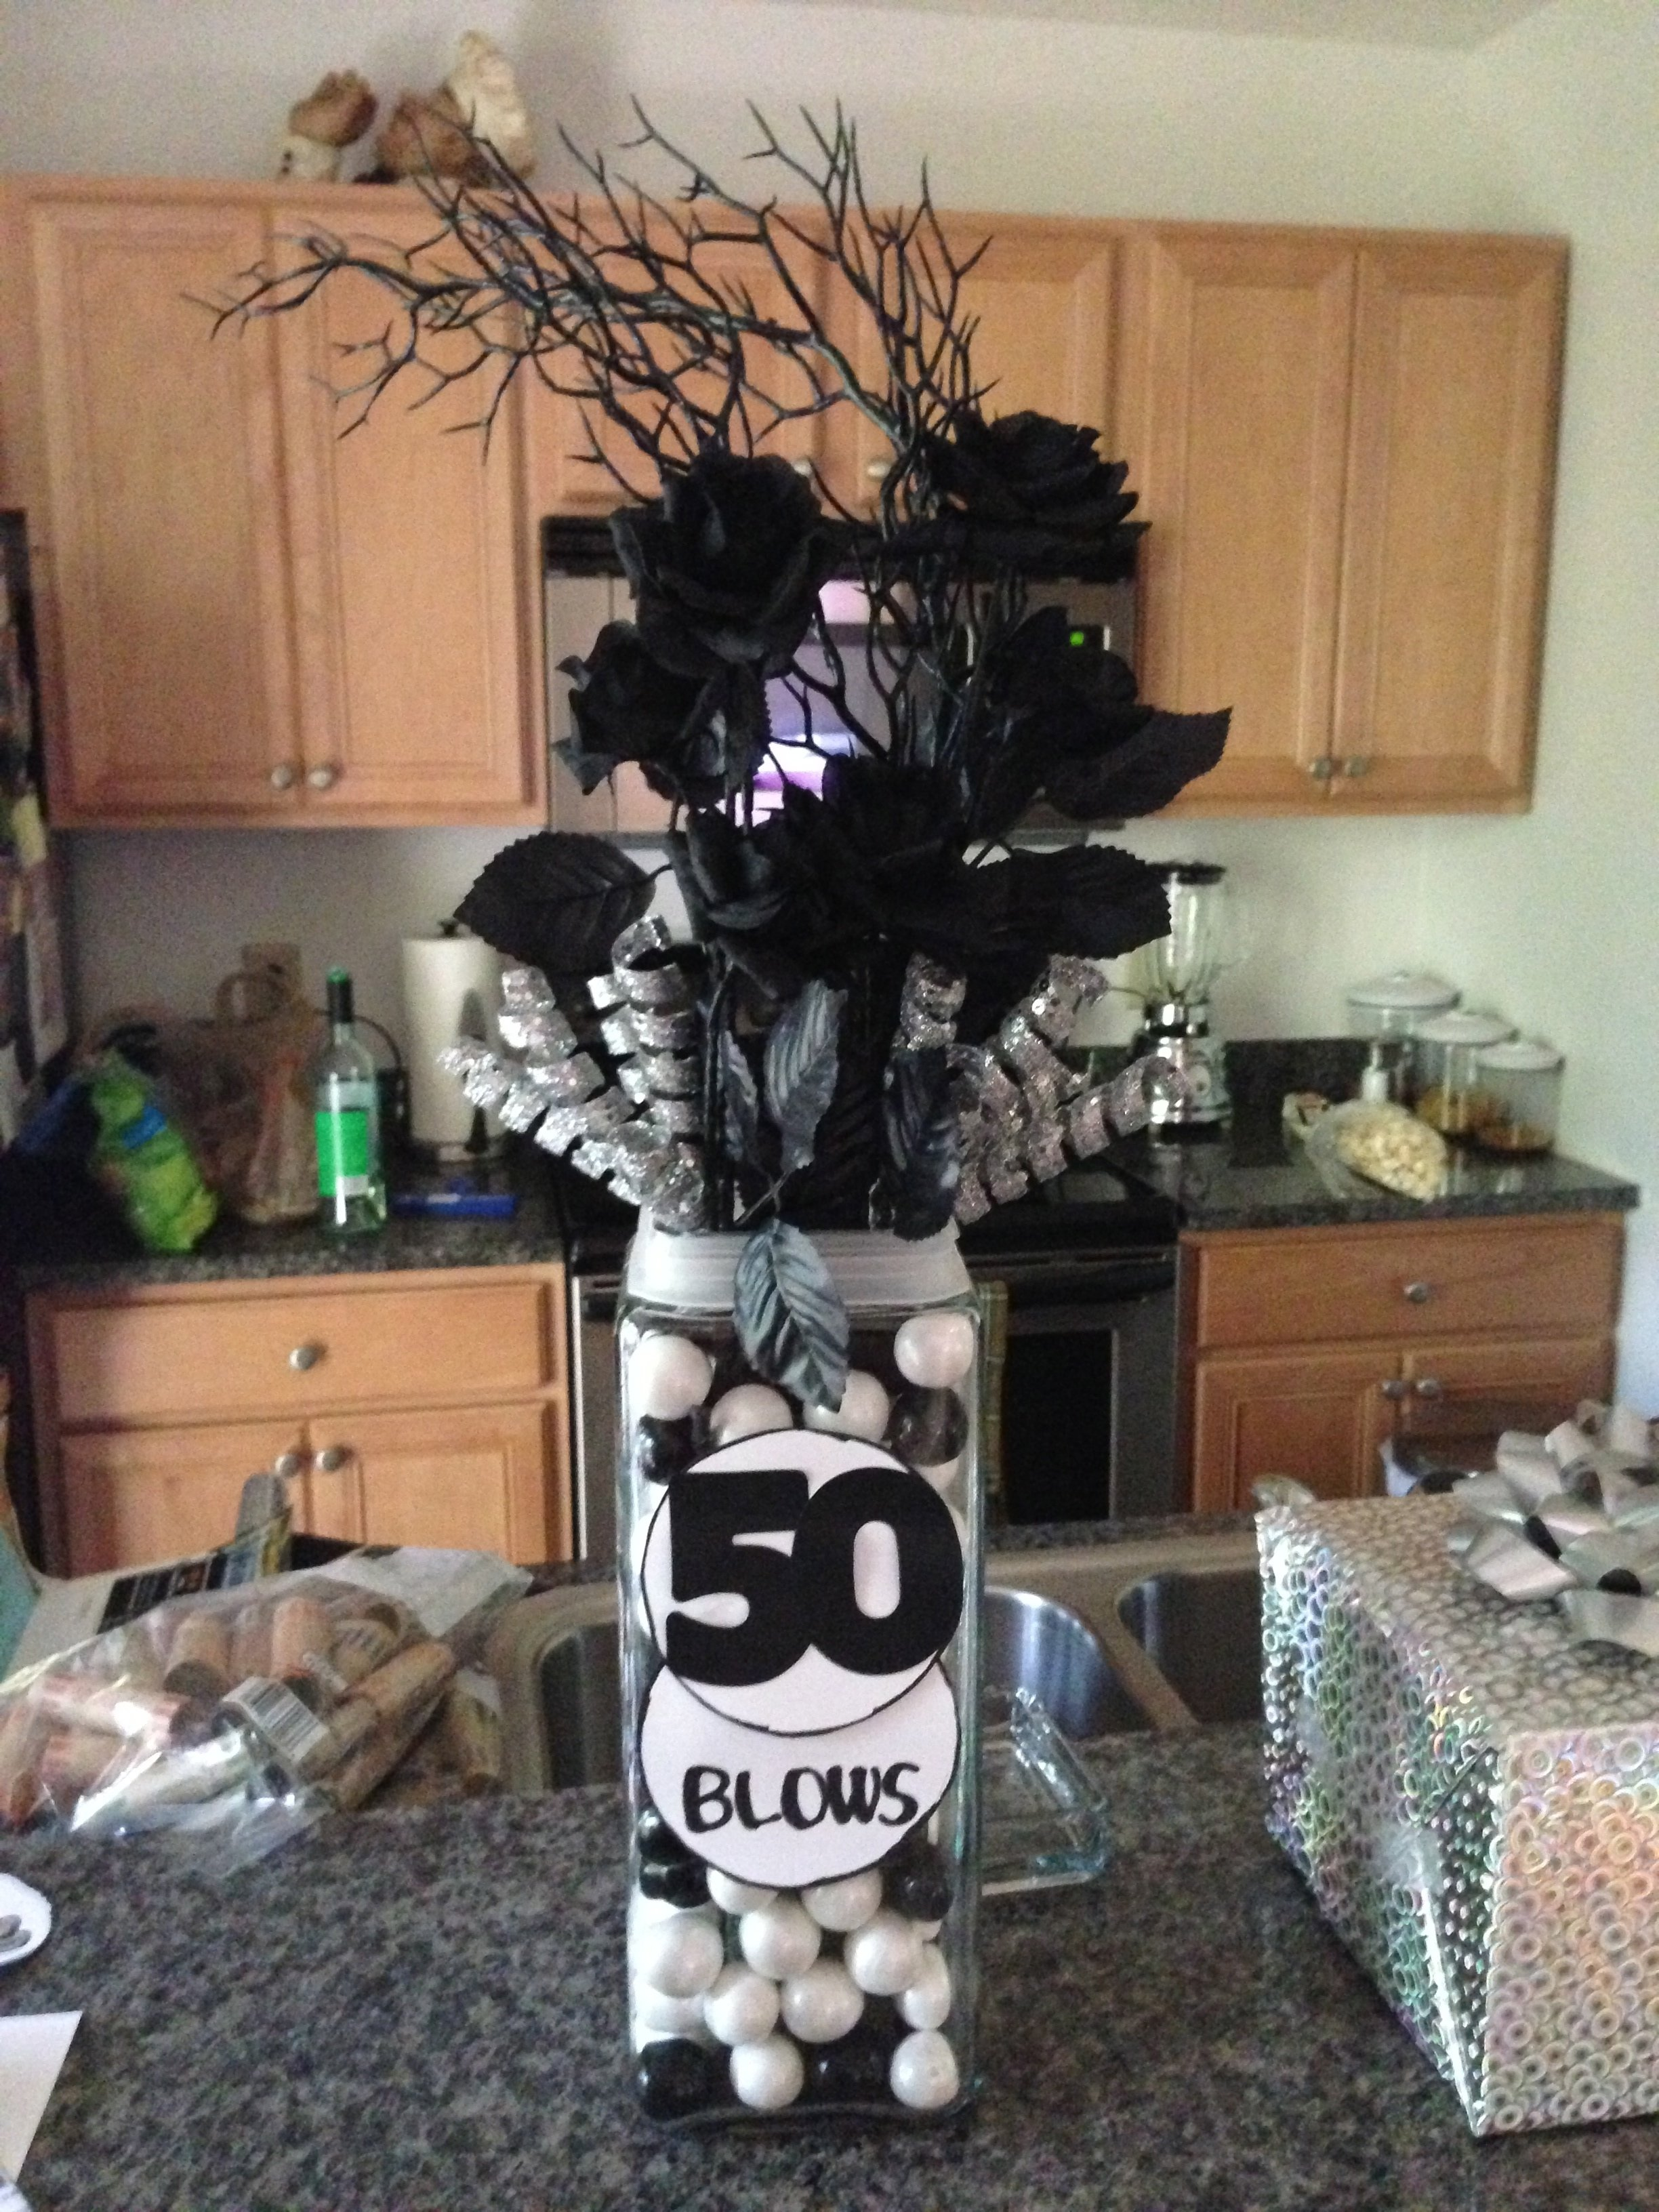 10 Fabulous 50Th Birthday Party Centerpiece Ideas my version of a 50th birthday centerpiece idea i saw on pinterest 2020